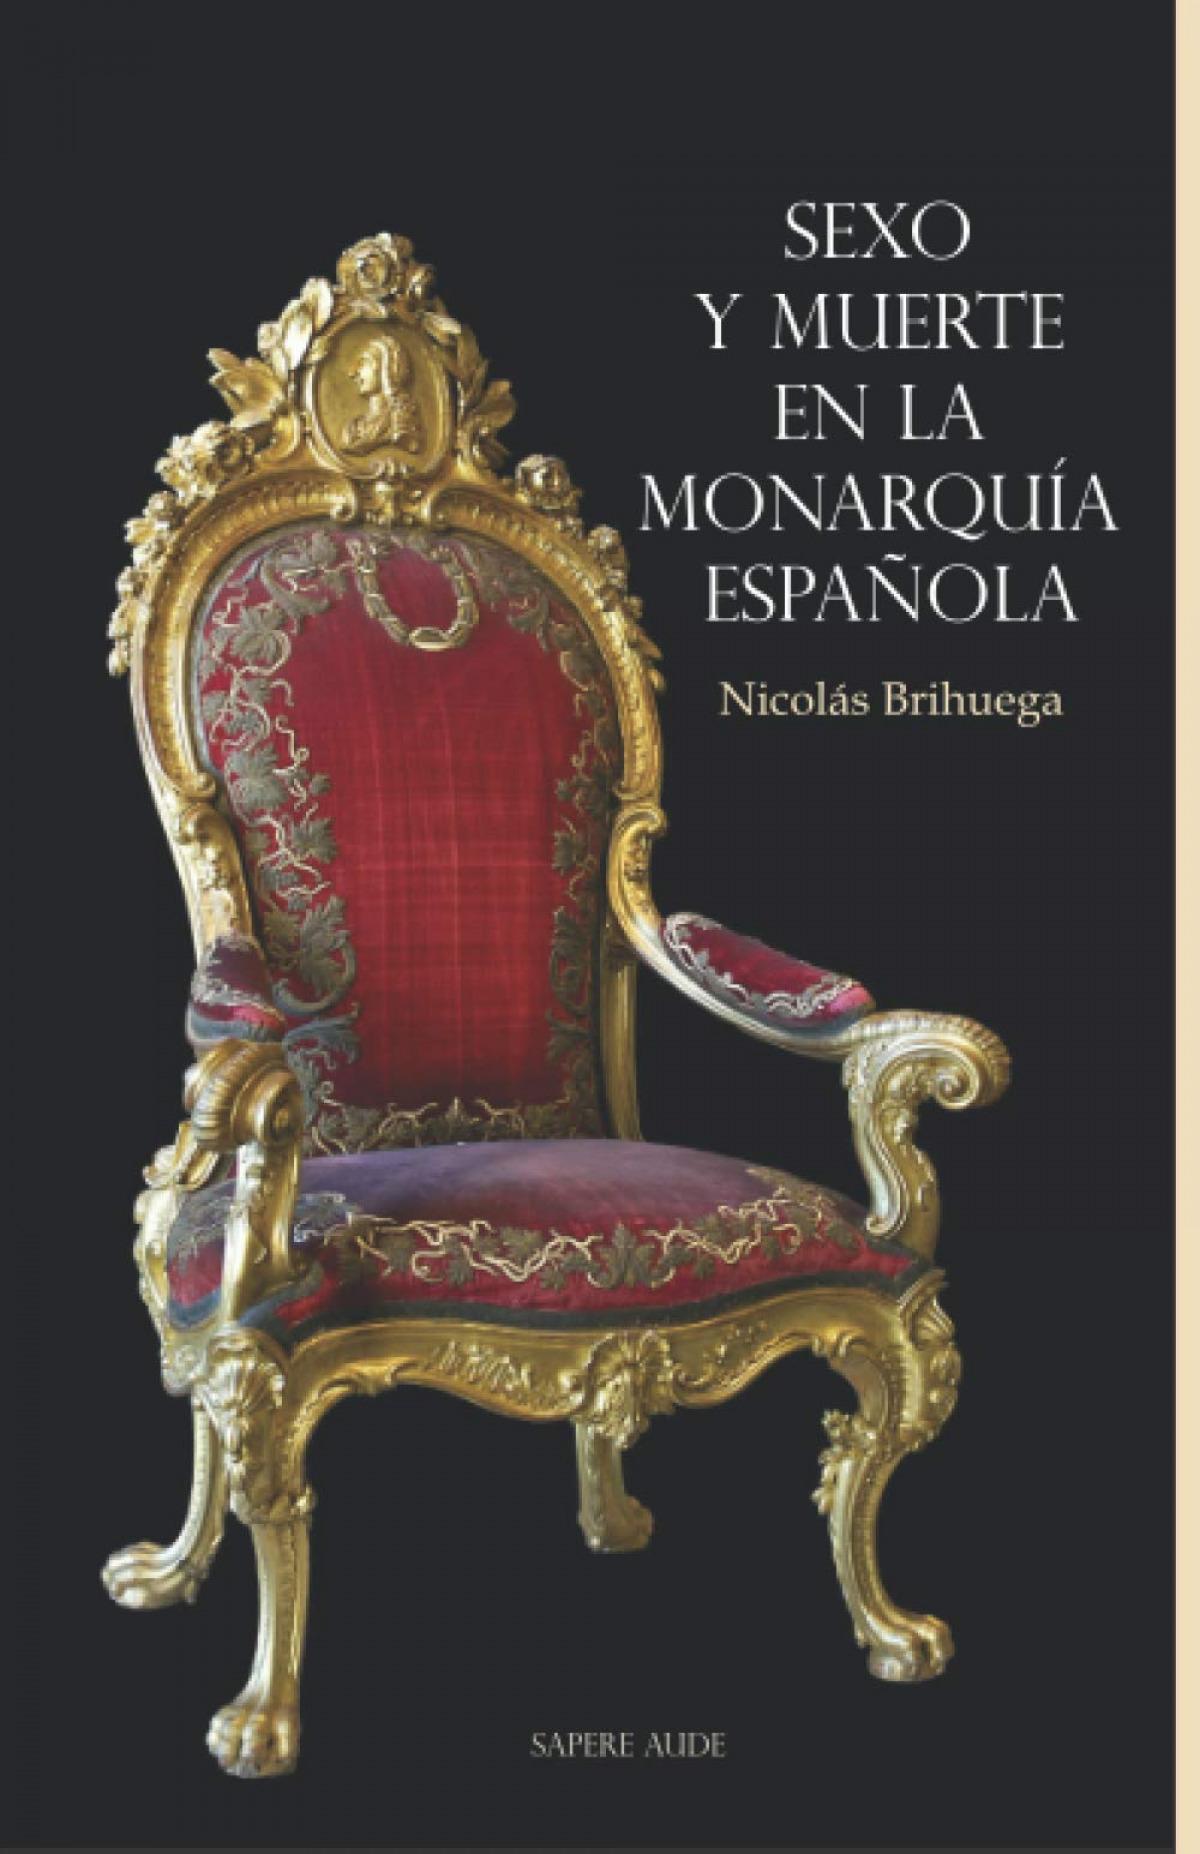 SEXO Y MUERTE EN LA MONARQUÃìA ESPAÃæOLA